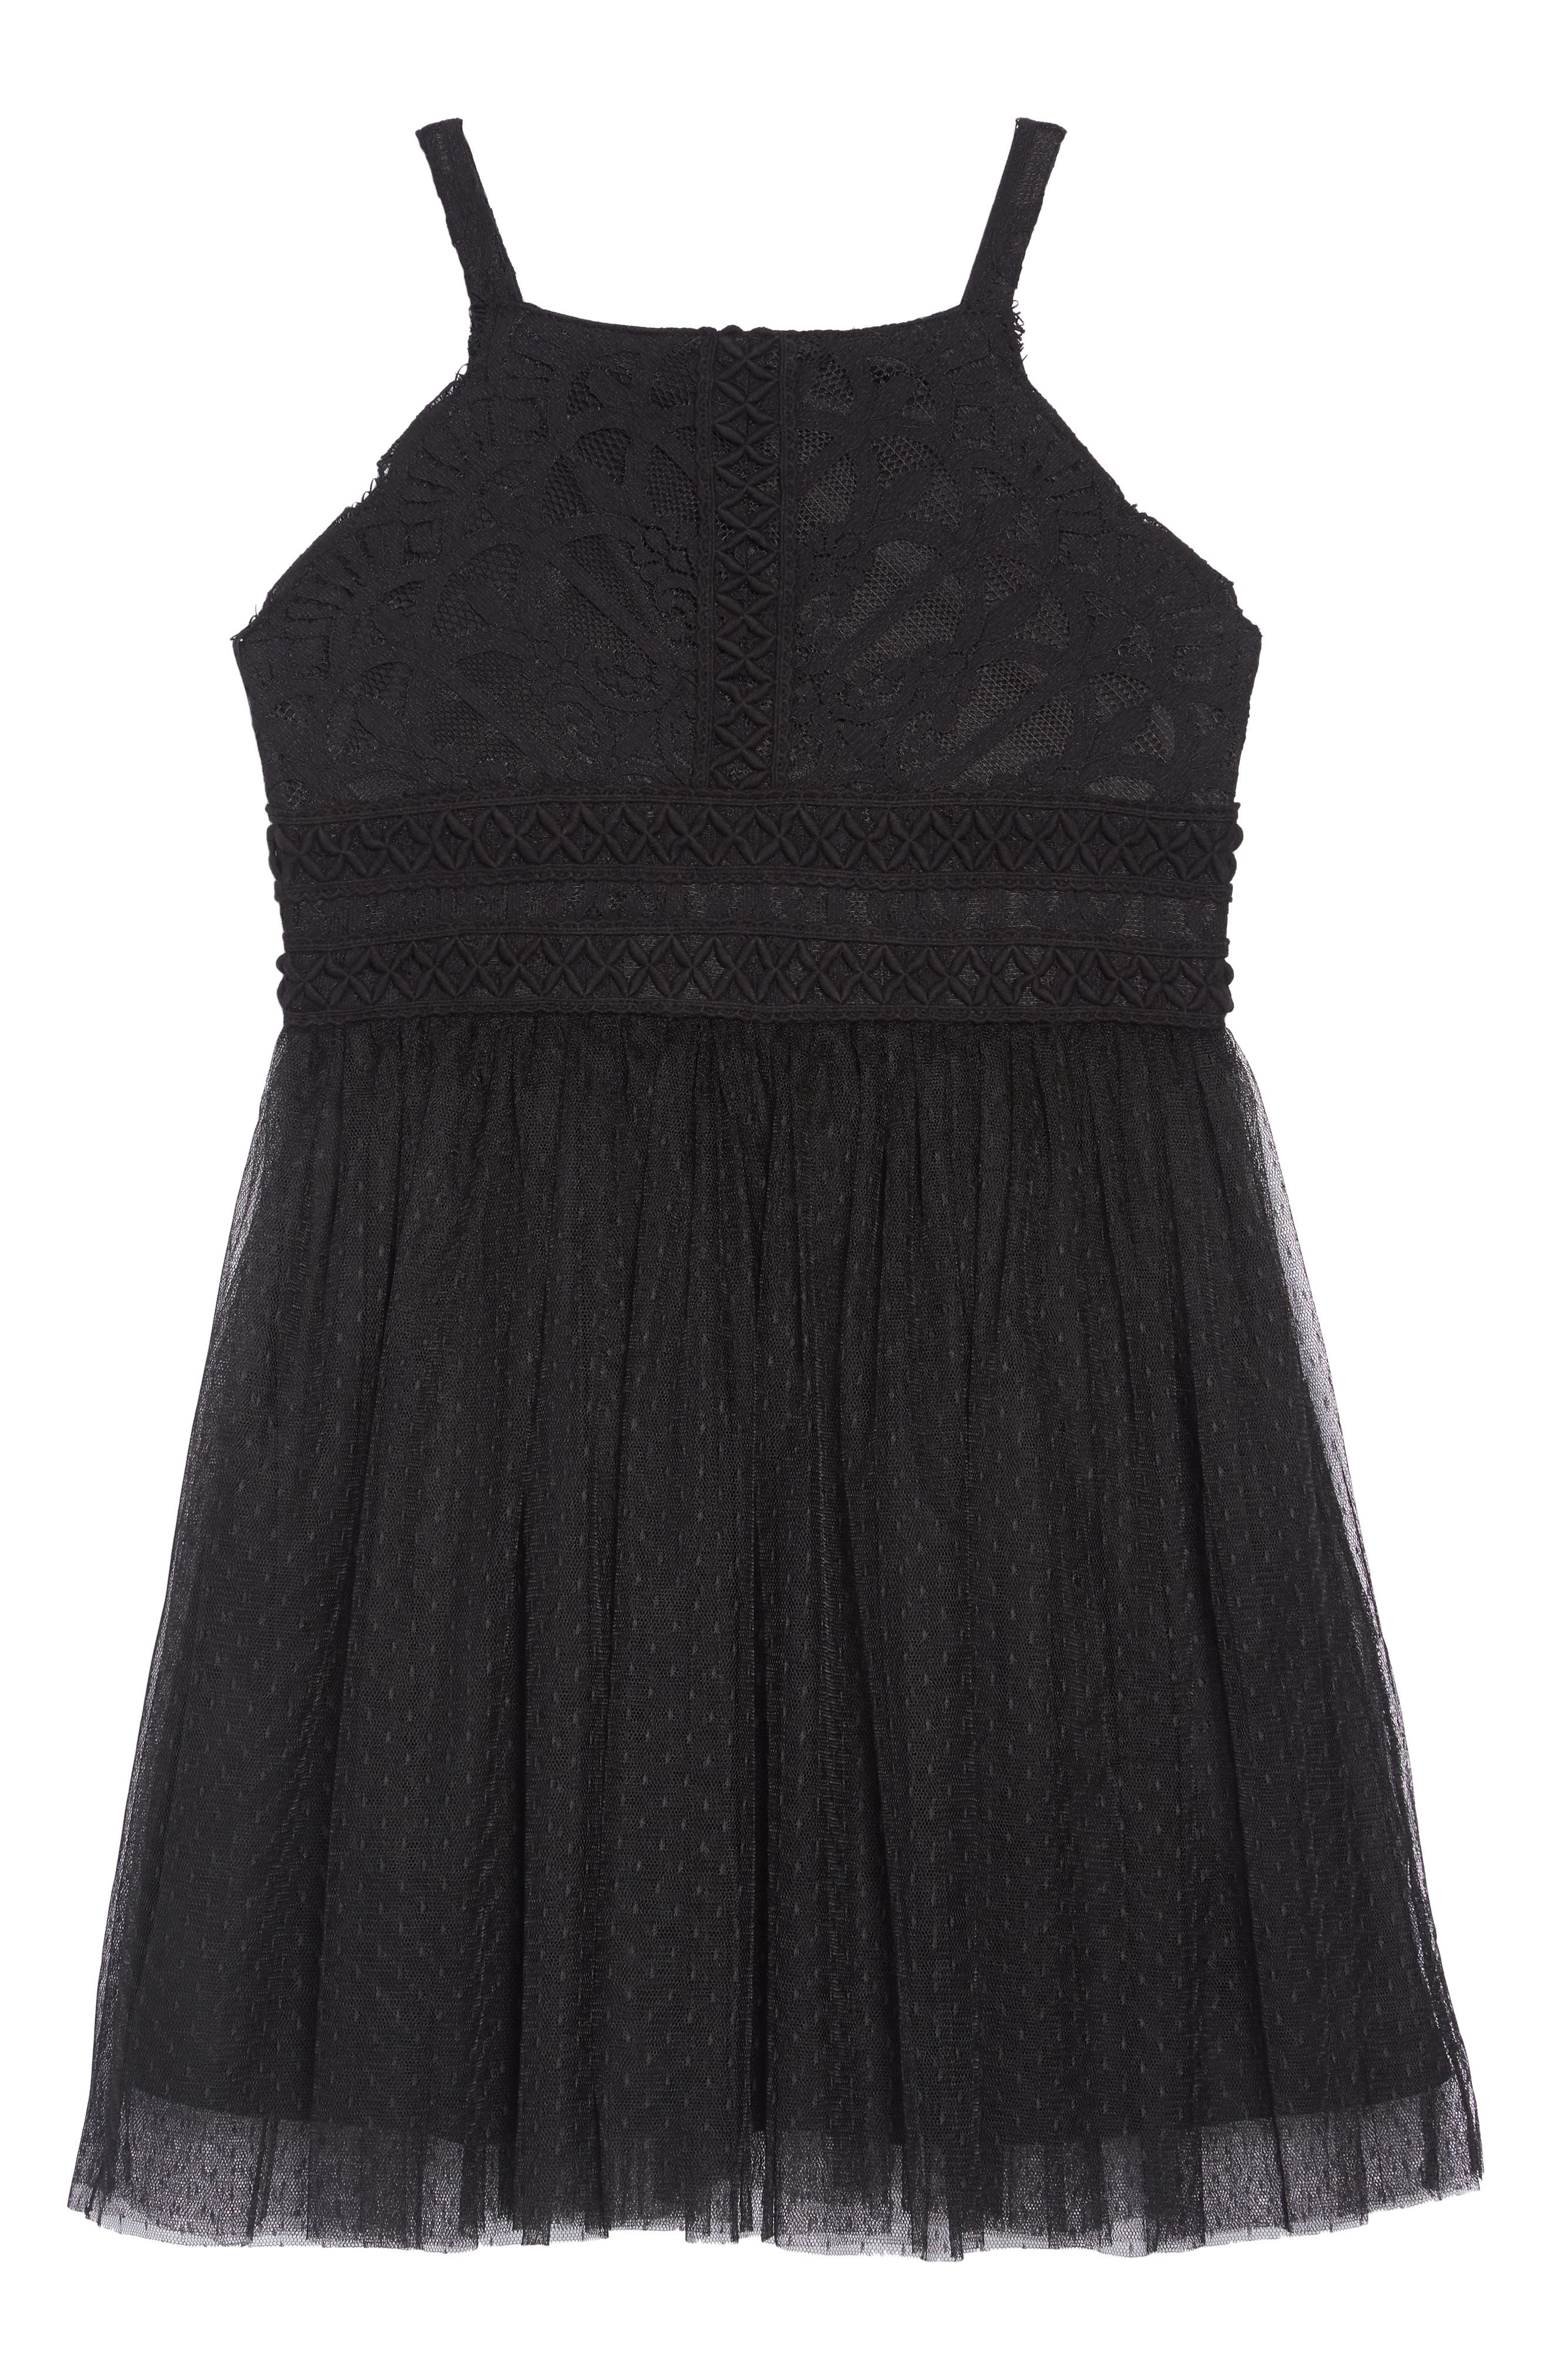 Sleeveless Tulle Dress,                             Main thumbnail 1, color,                             BLACK